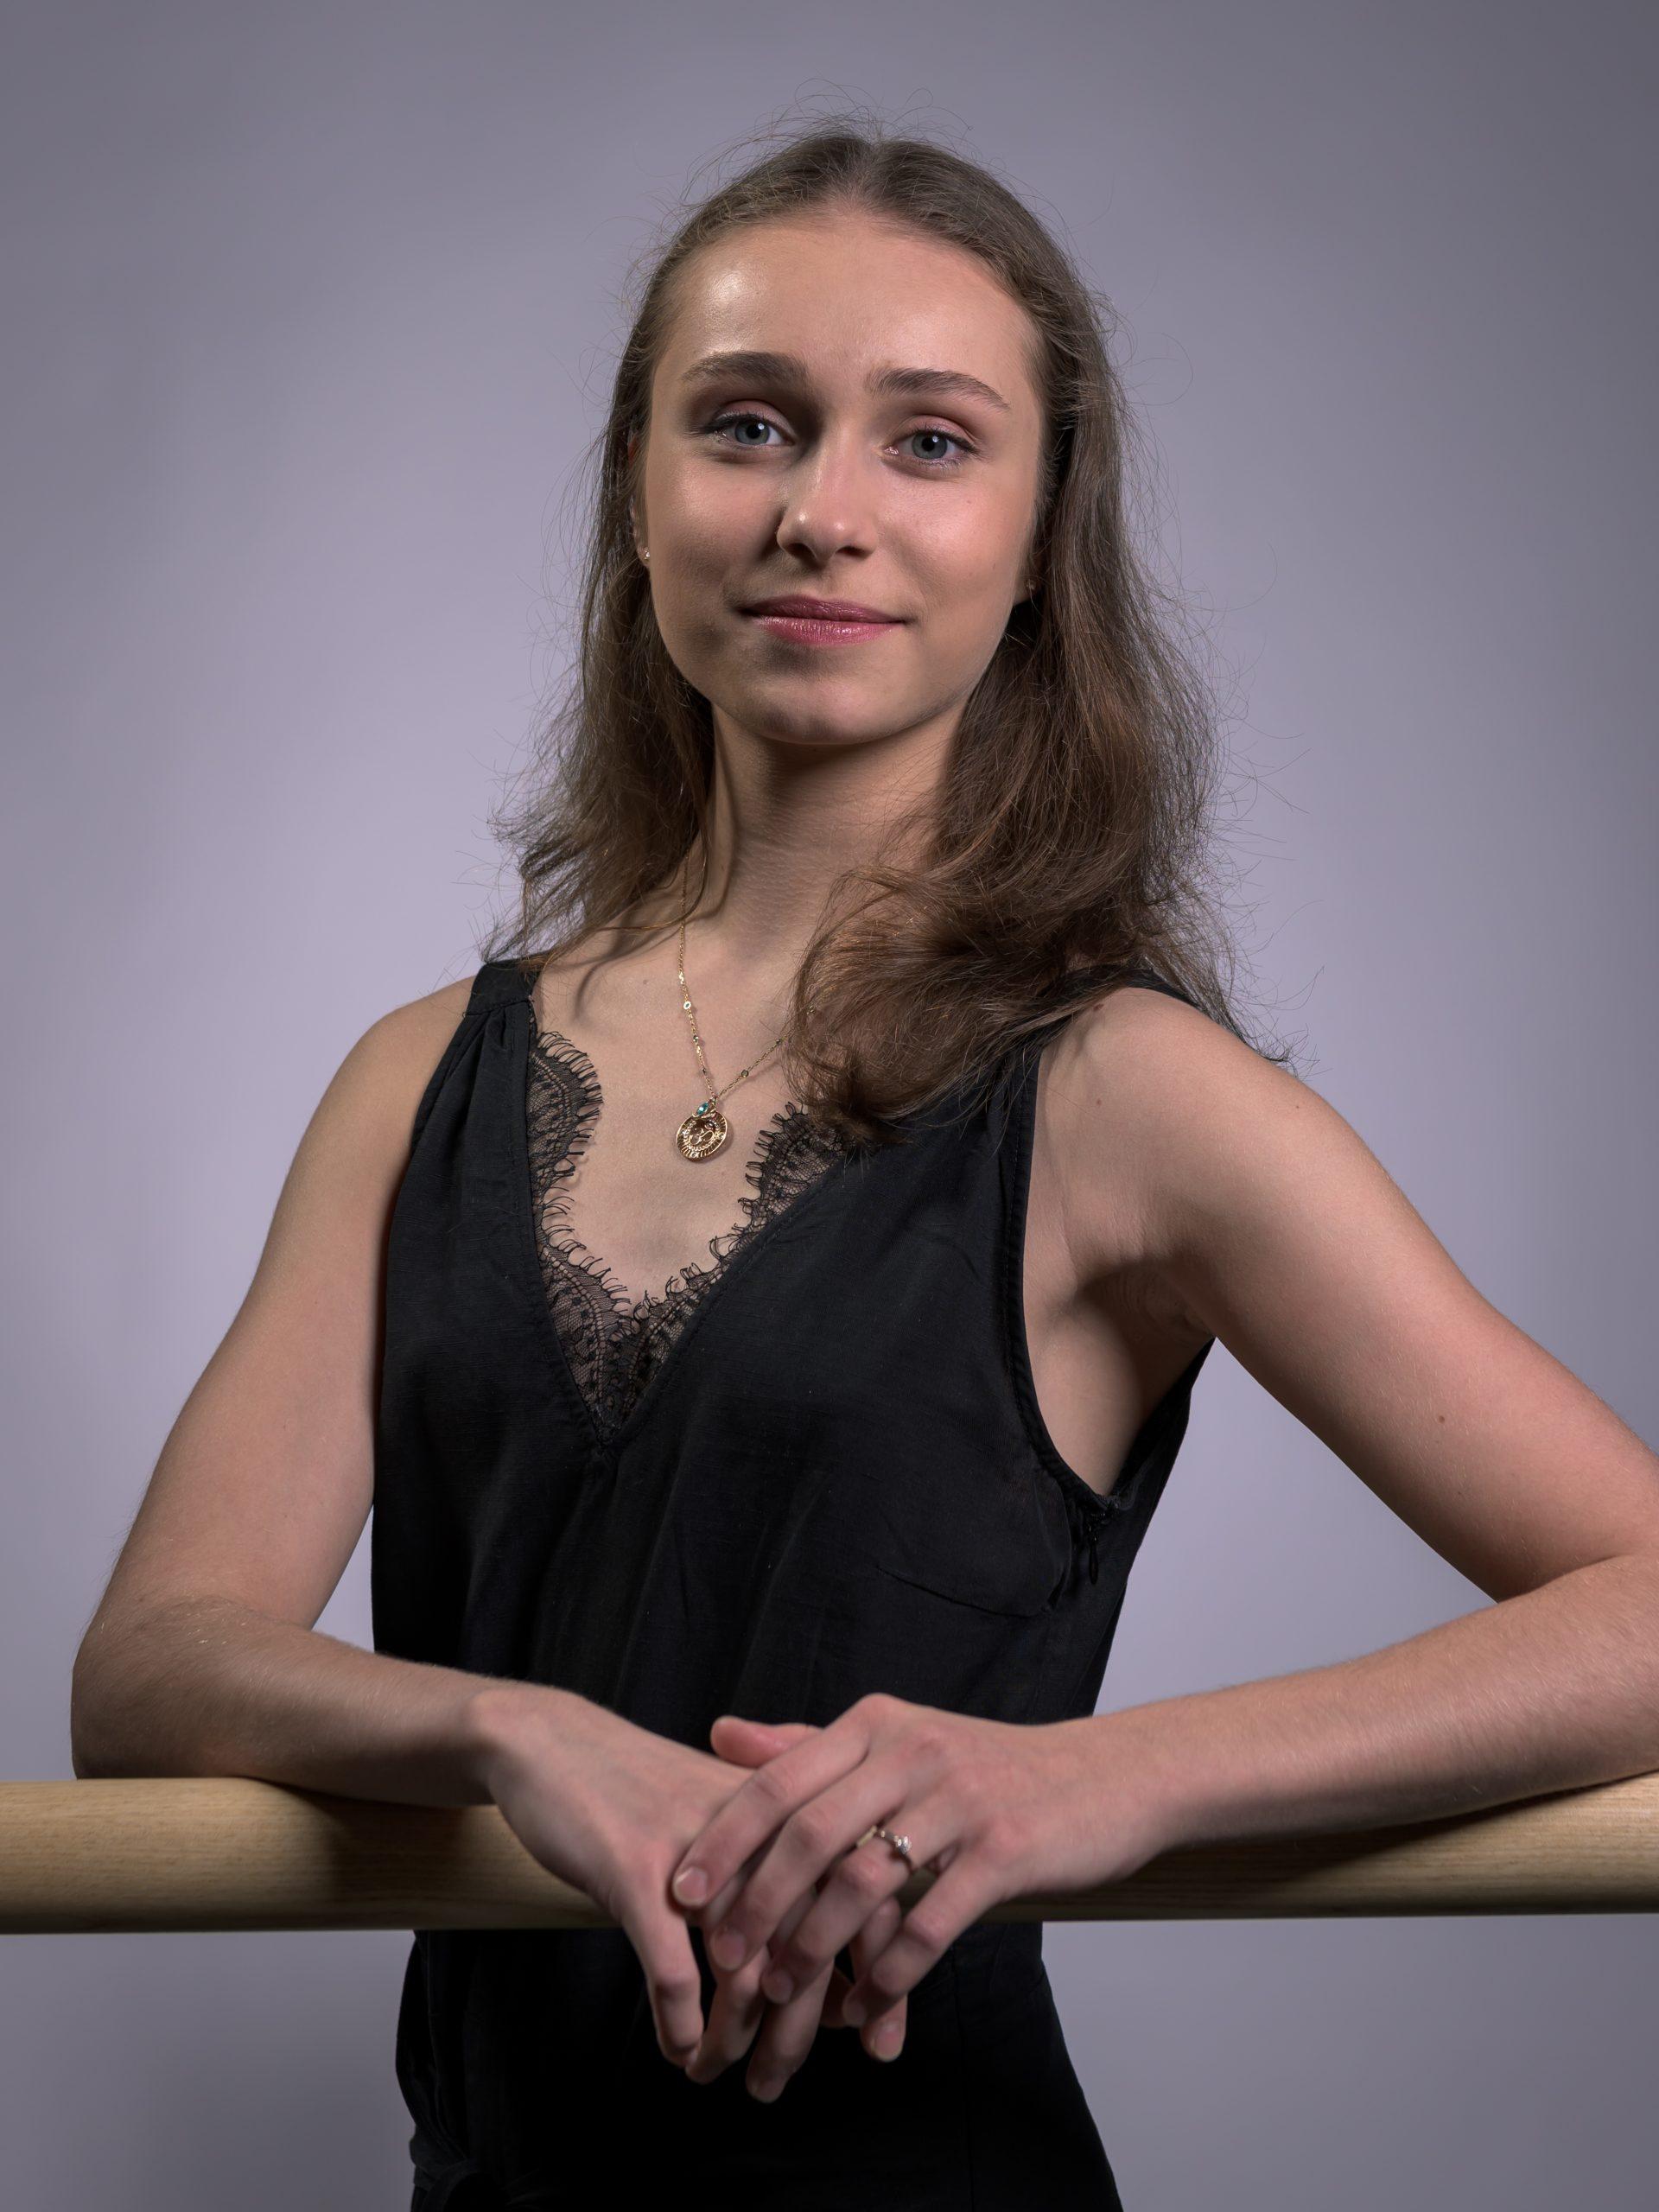 Maria Vorokhobina (Balet)